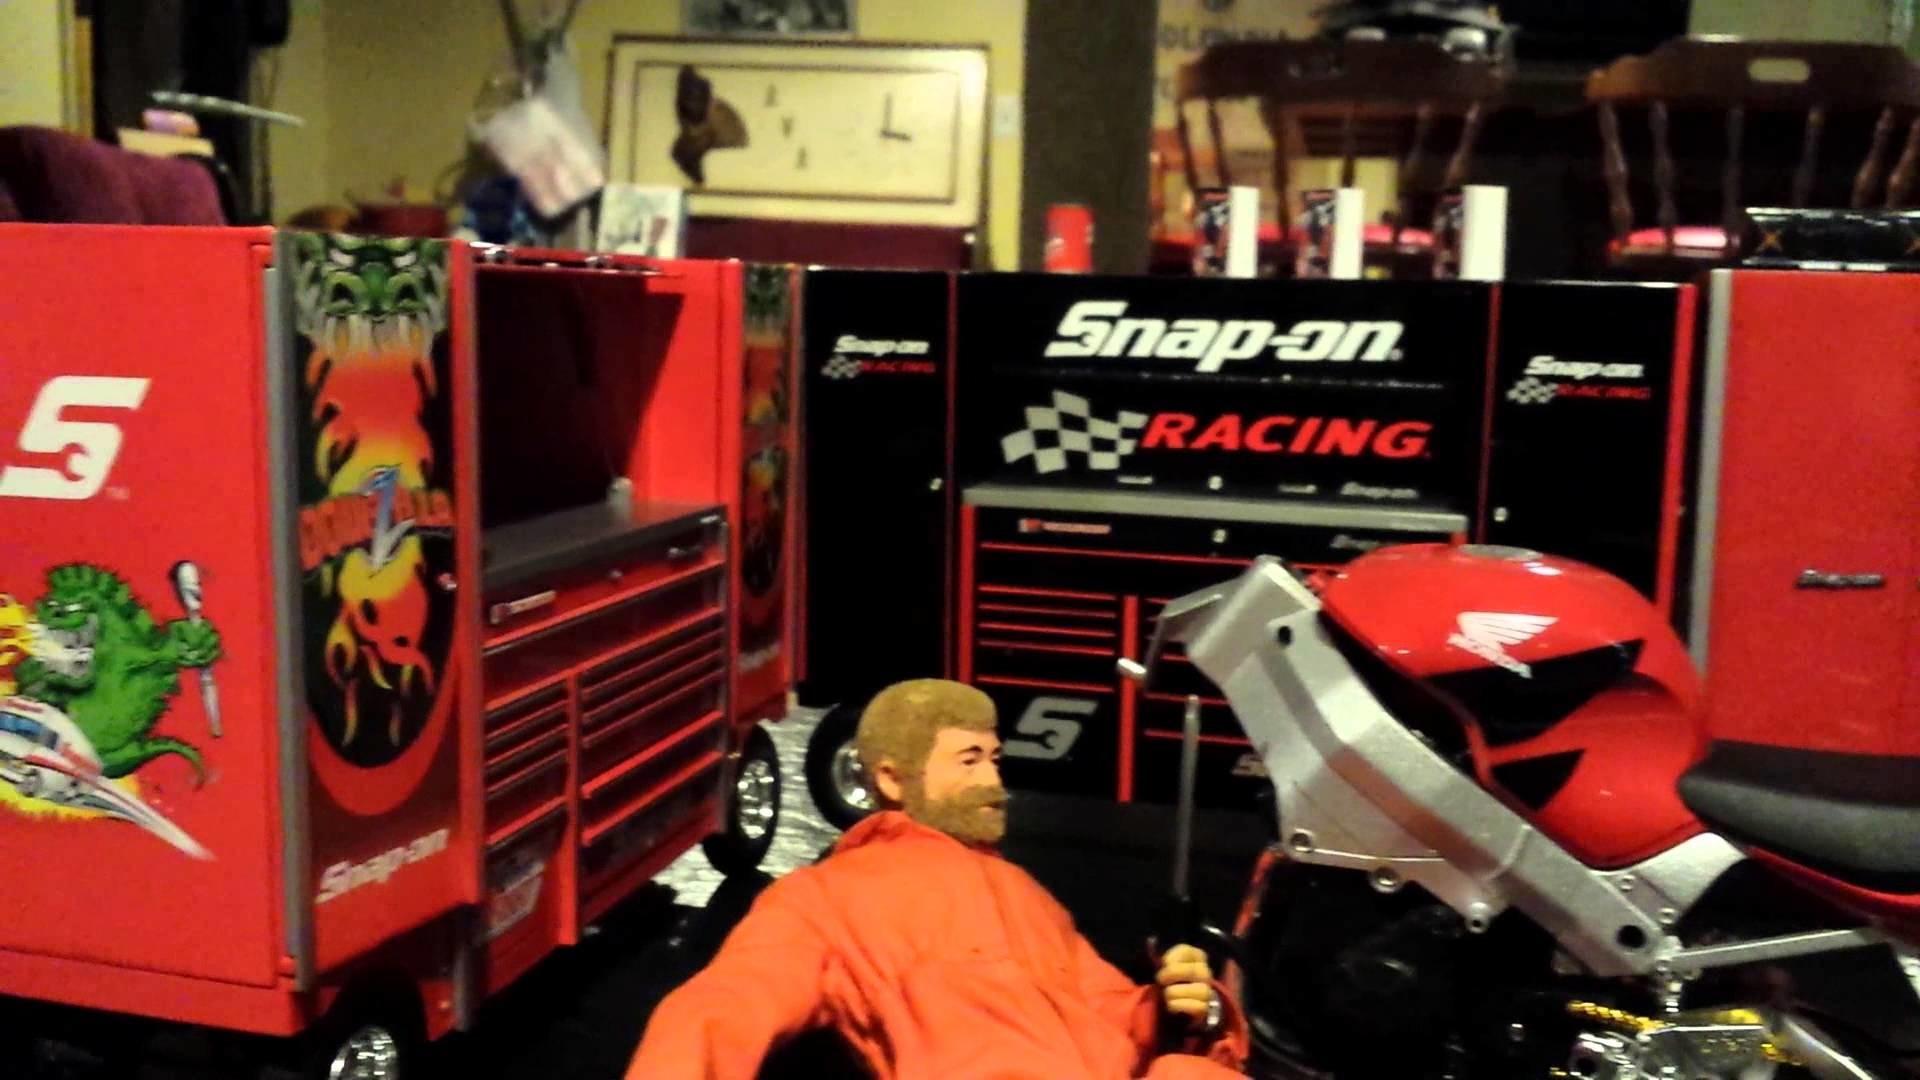 Snap on Tools Diorama Gi joe Scale 1/6